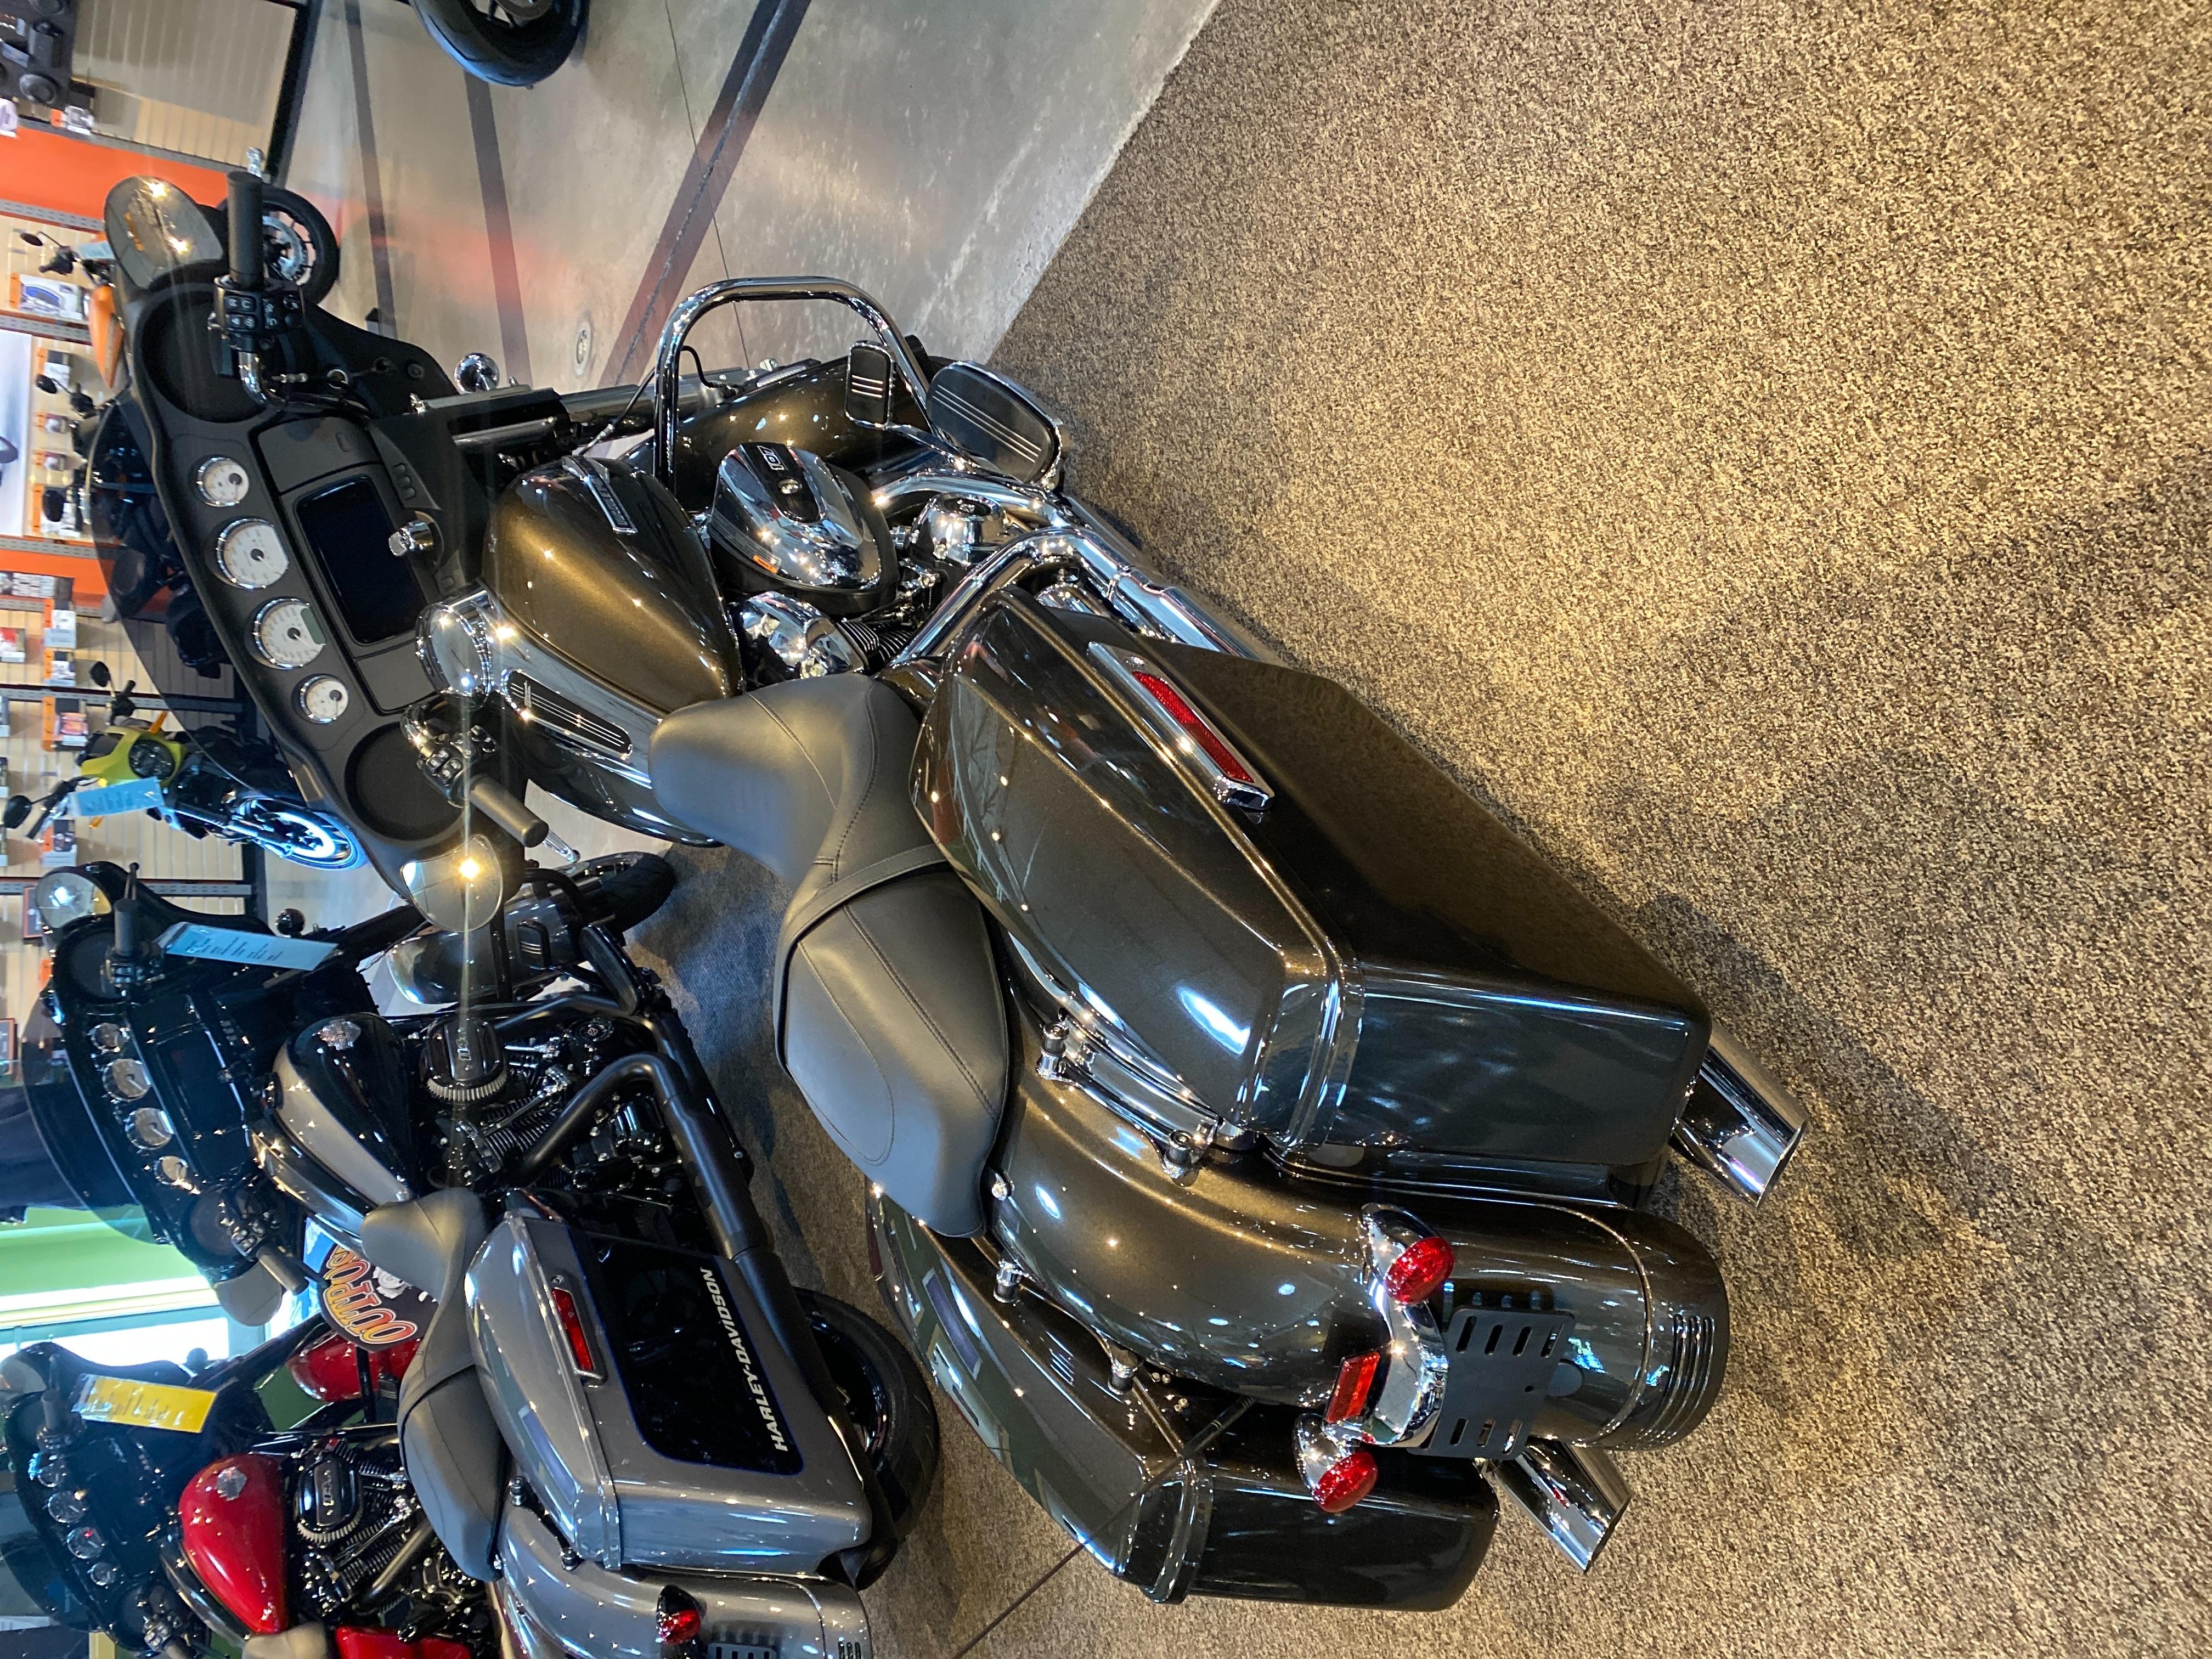 2021 Harley-Davidson Grand American Touring Street Glide at Outpost Harley-Davidson